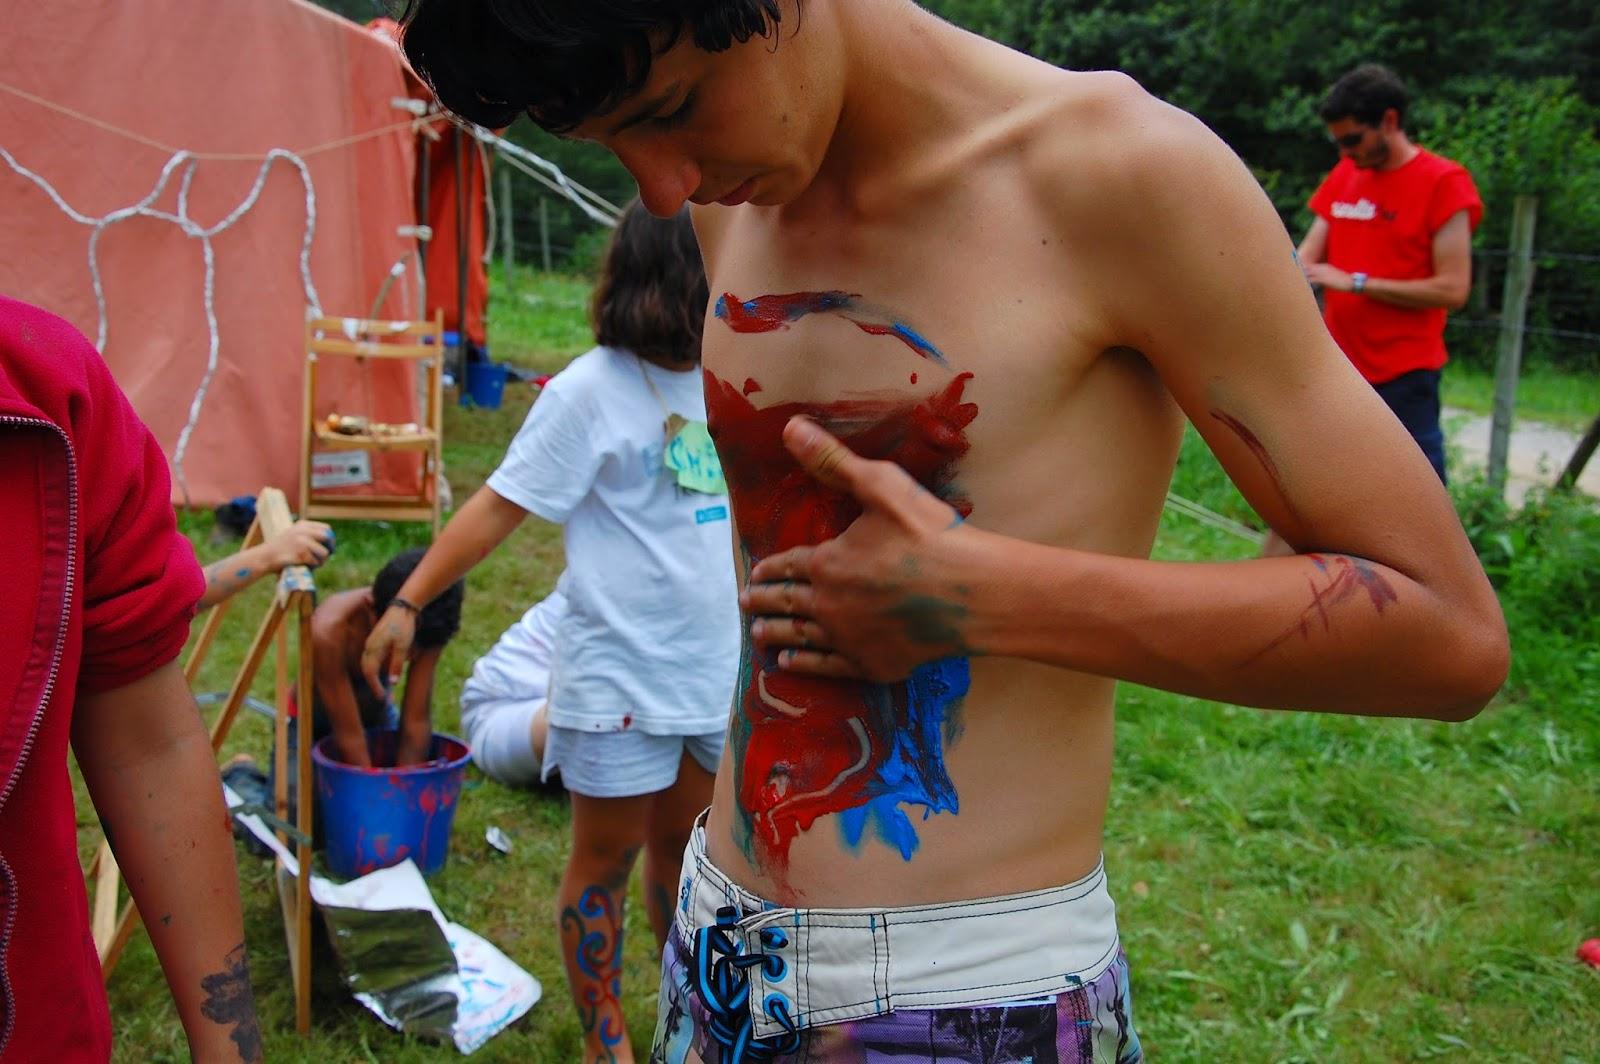 Campaments Estiu RolandKing 2011 - DSC_0344.JPG